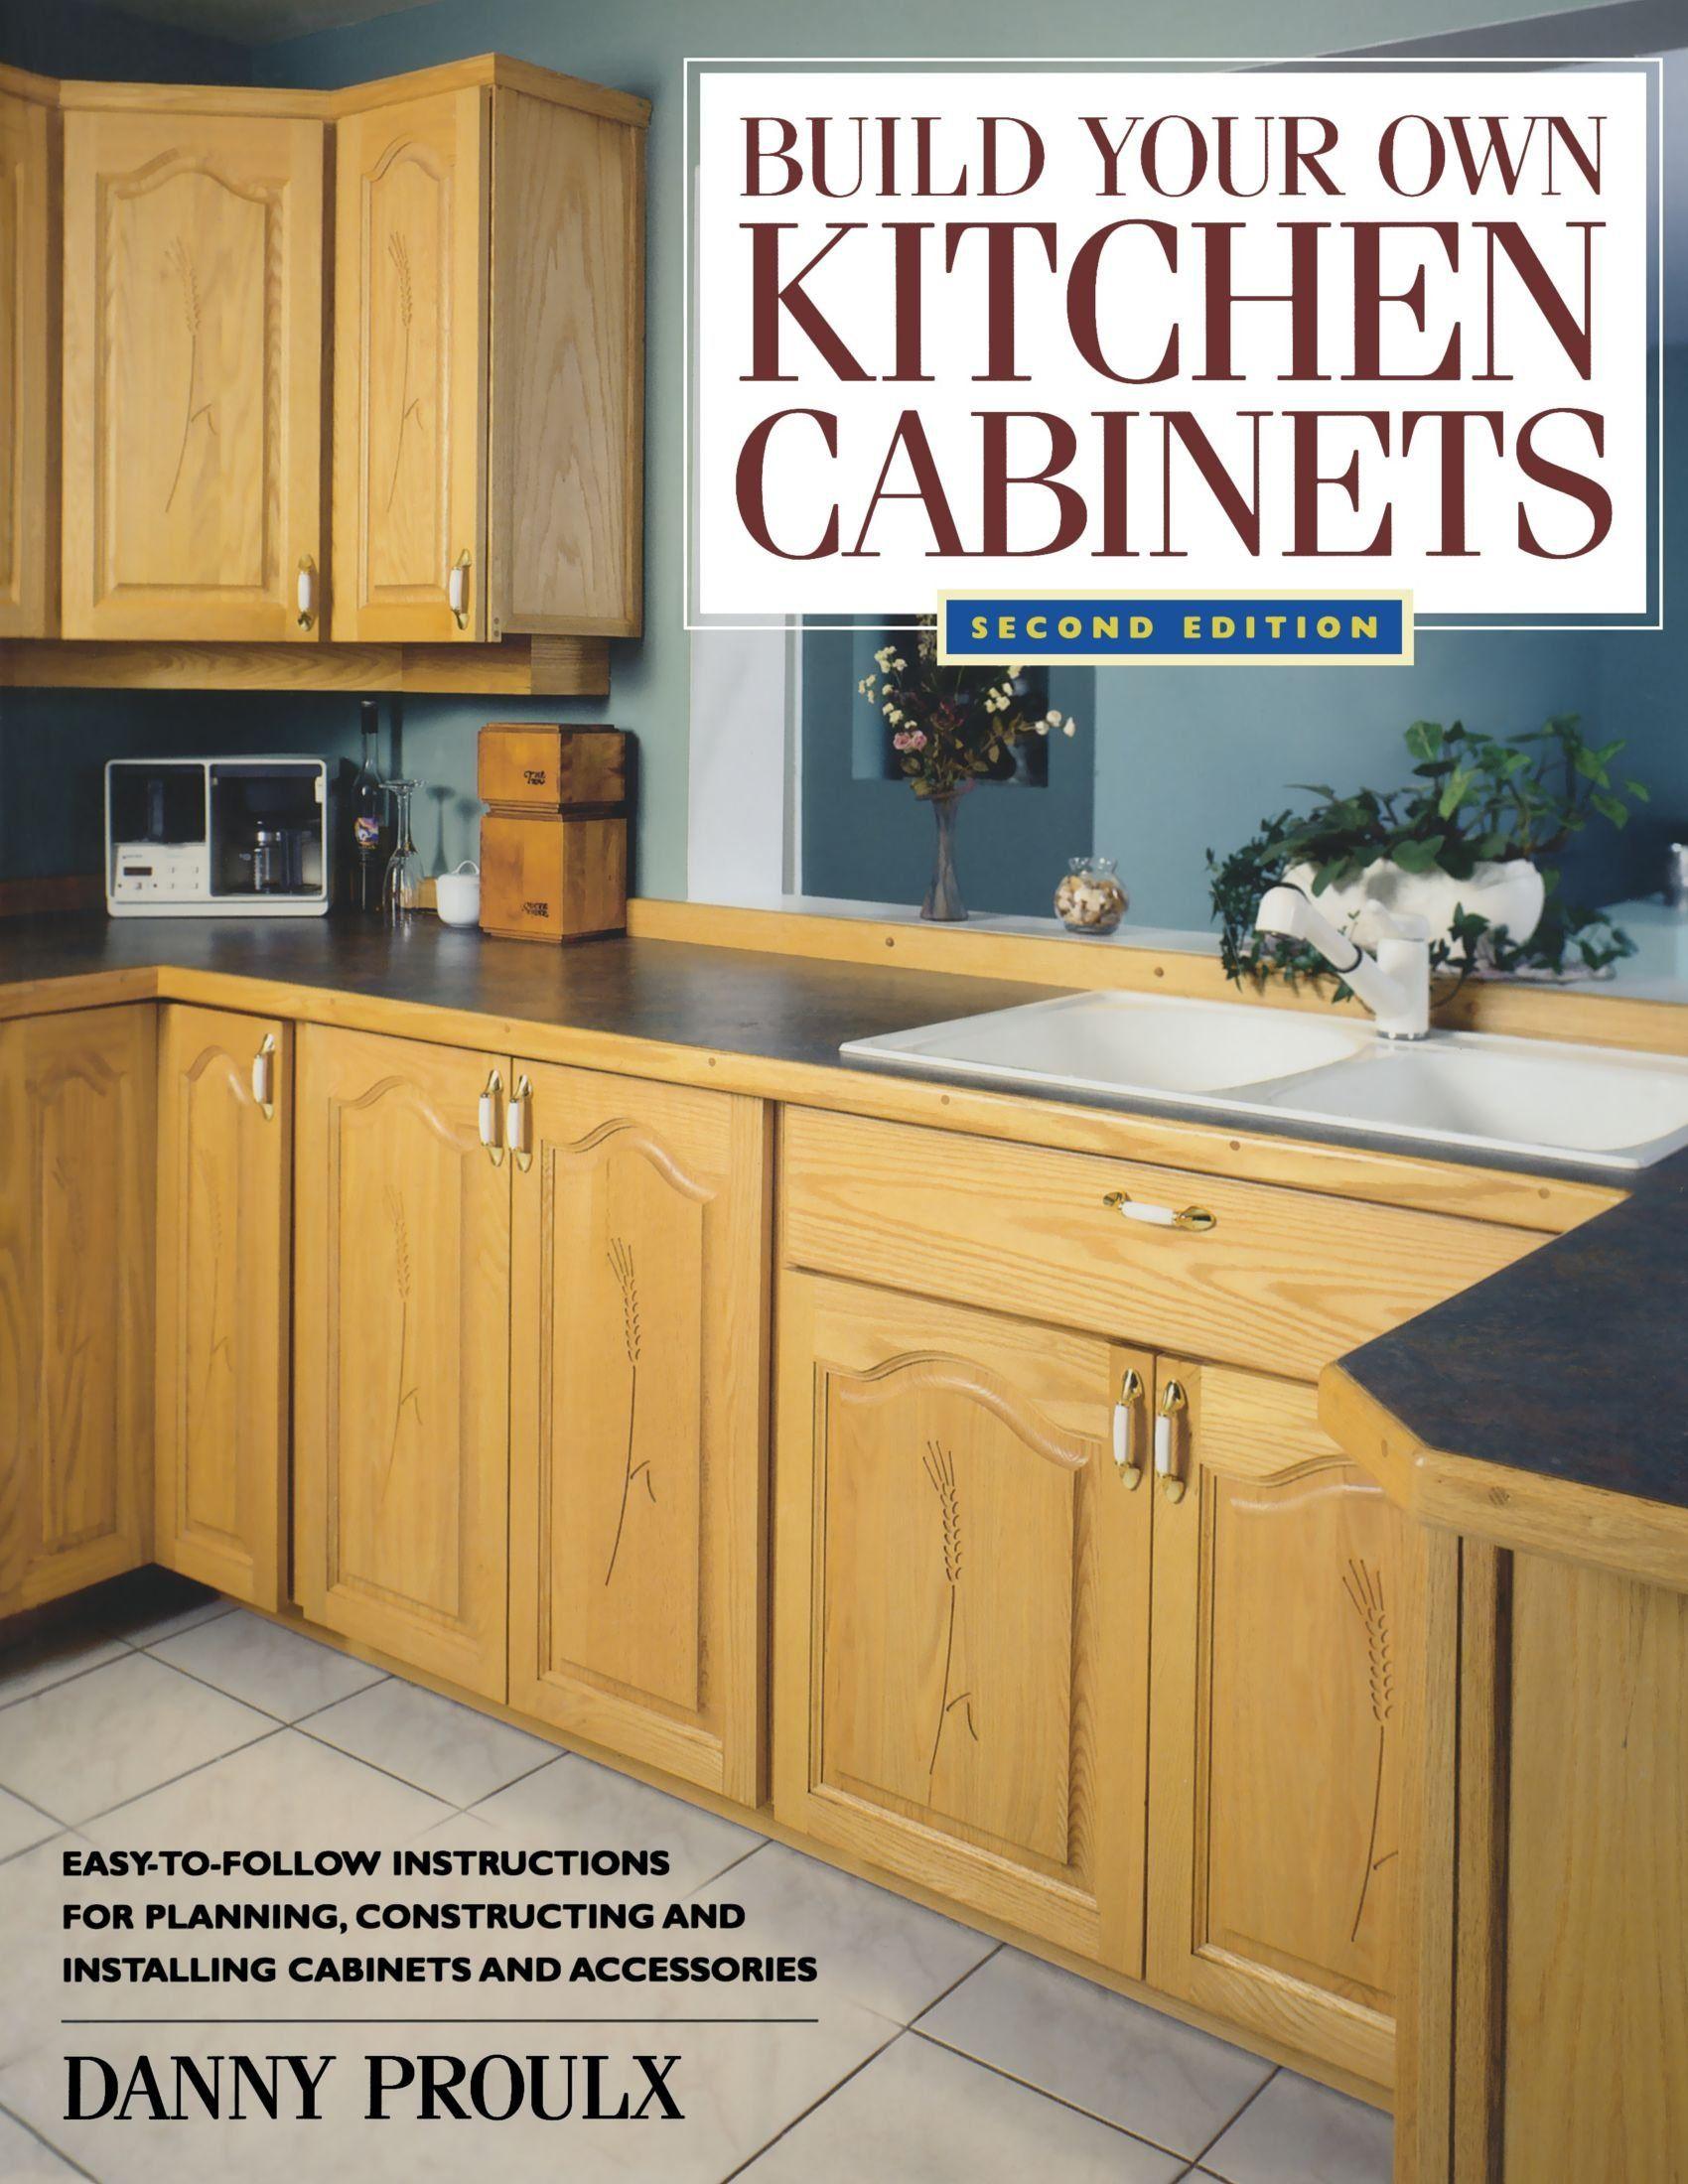 Kitchen Cabinet Kits Sale 2020 In 2020 Building Kitchen Cabinets Frameless Kitchen Cabinets Diy Kitchen Cabinets